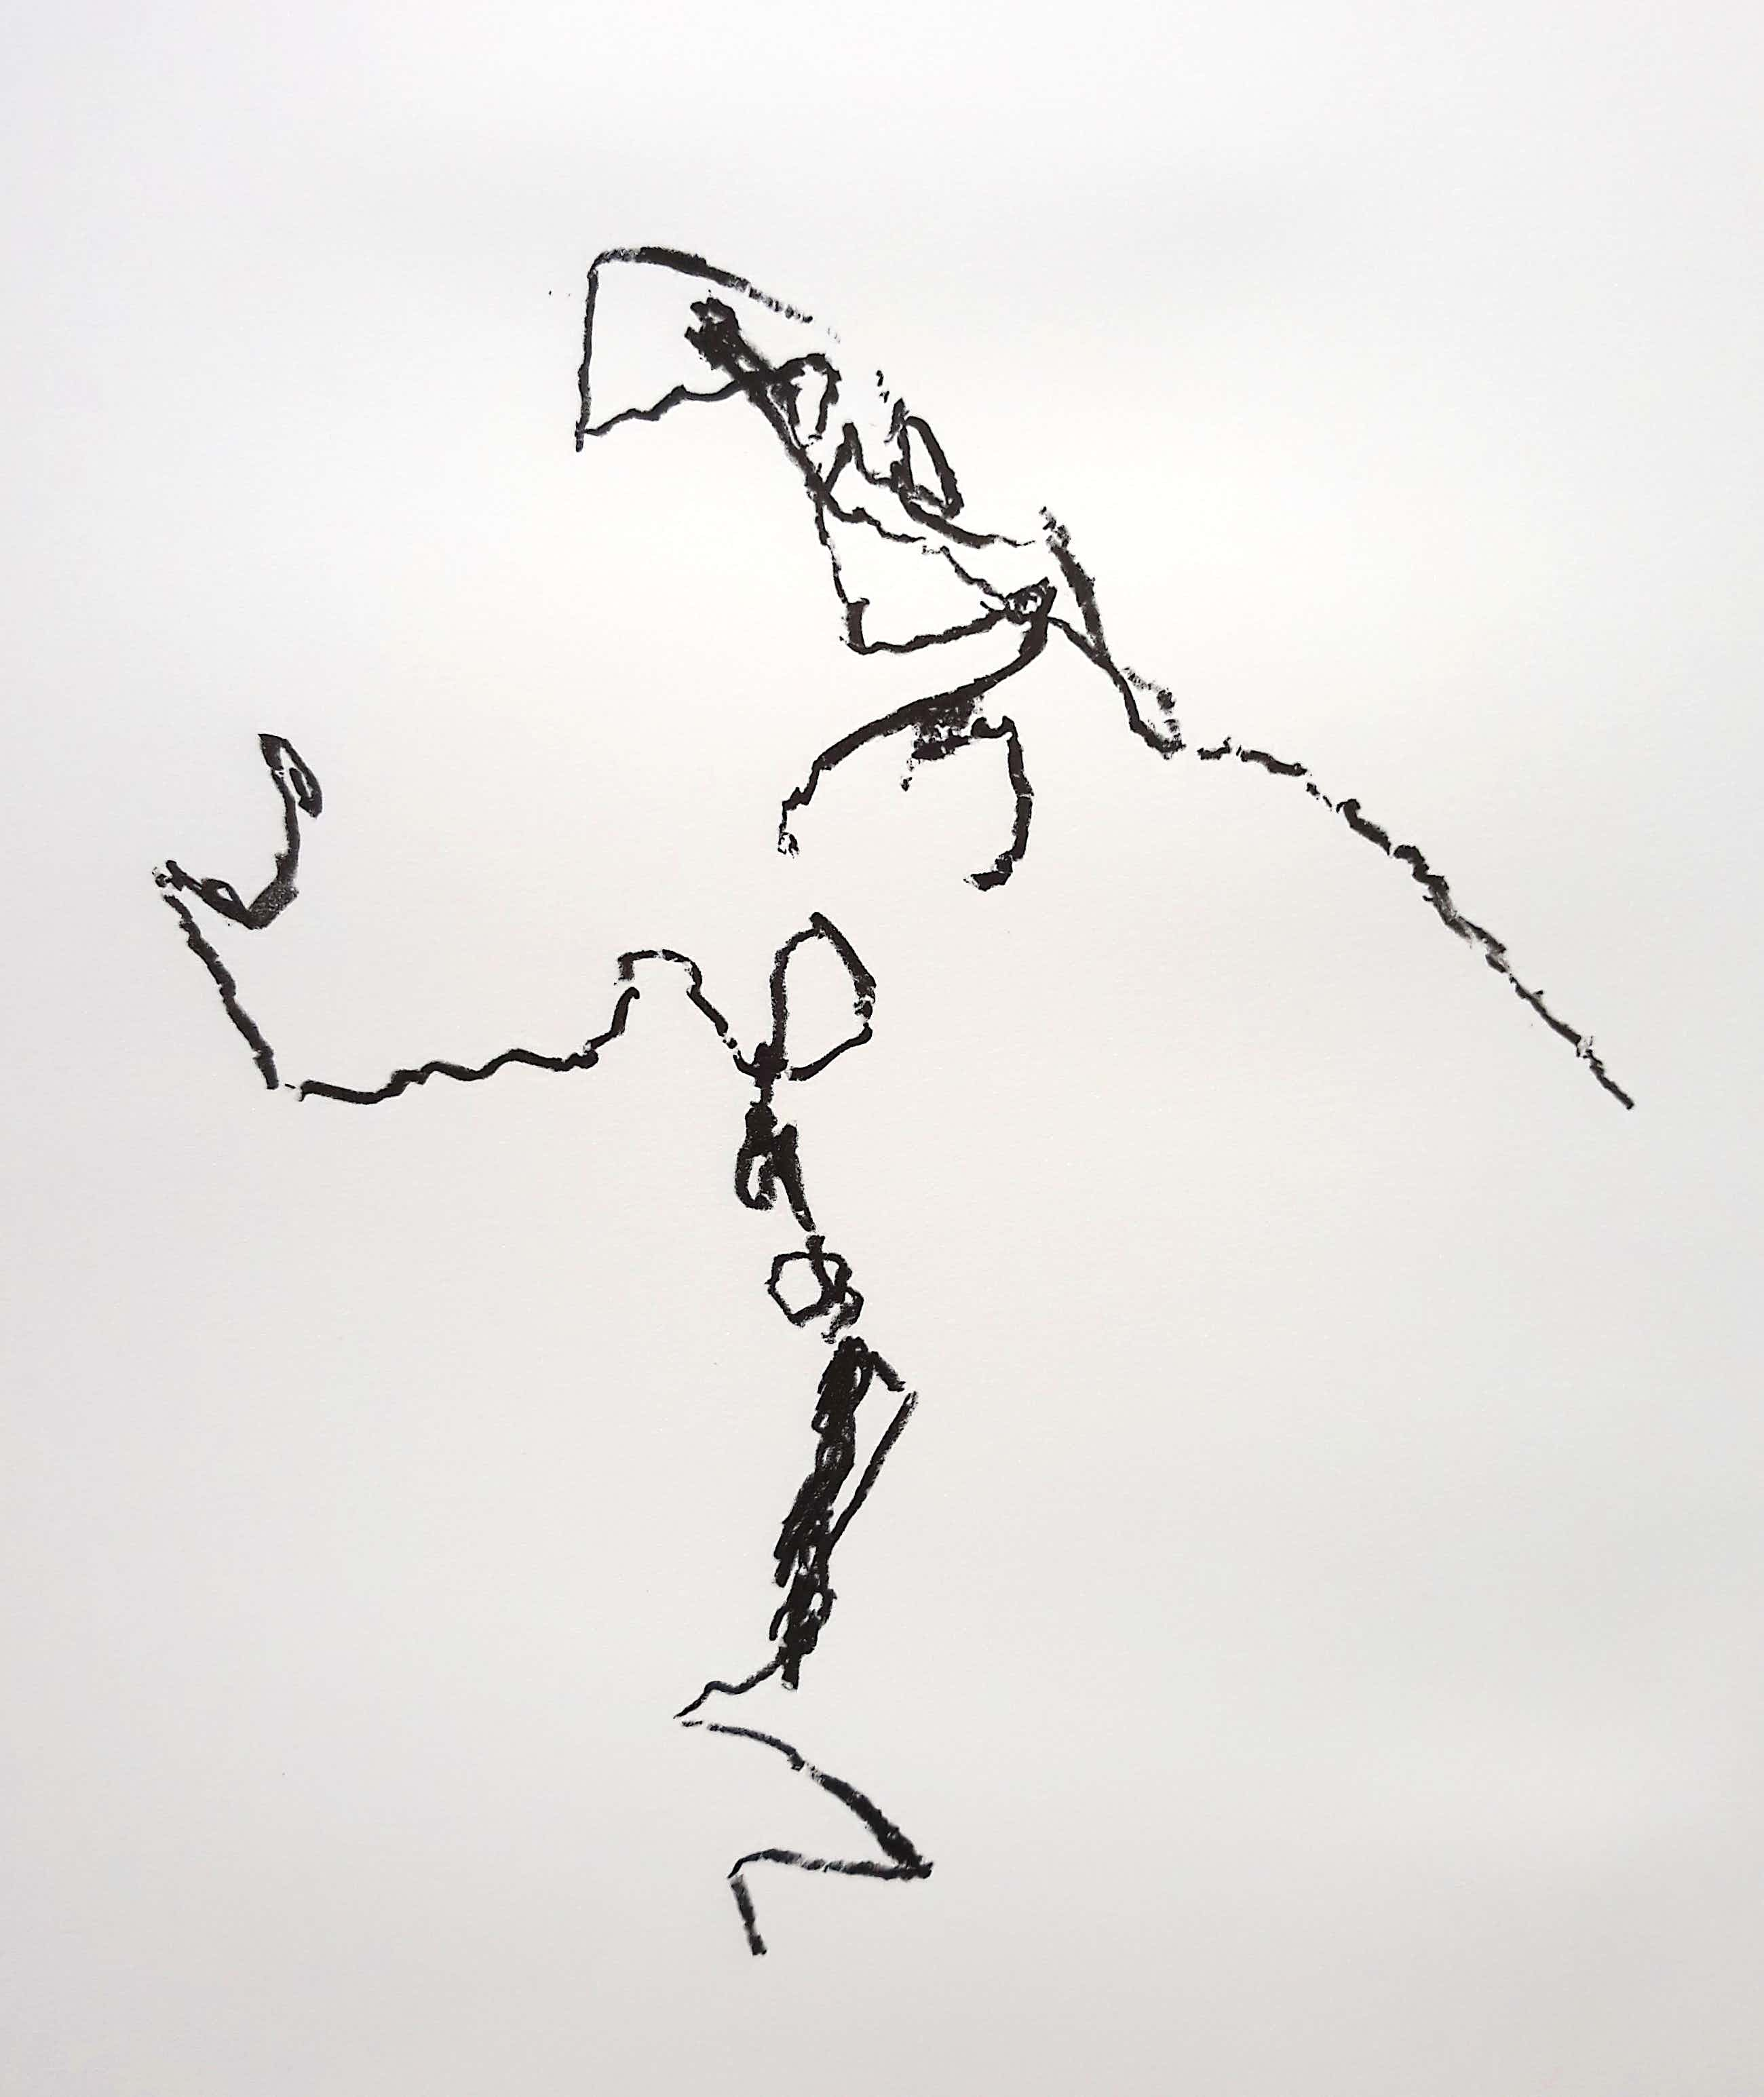 Armando - Abstracte compositie, litho kopen? Bied vanaf 150!